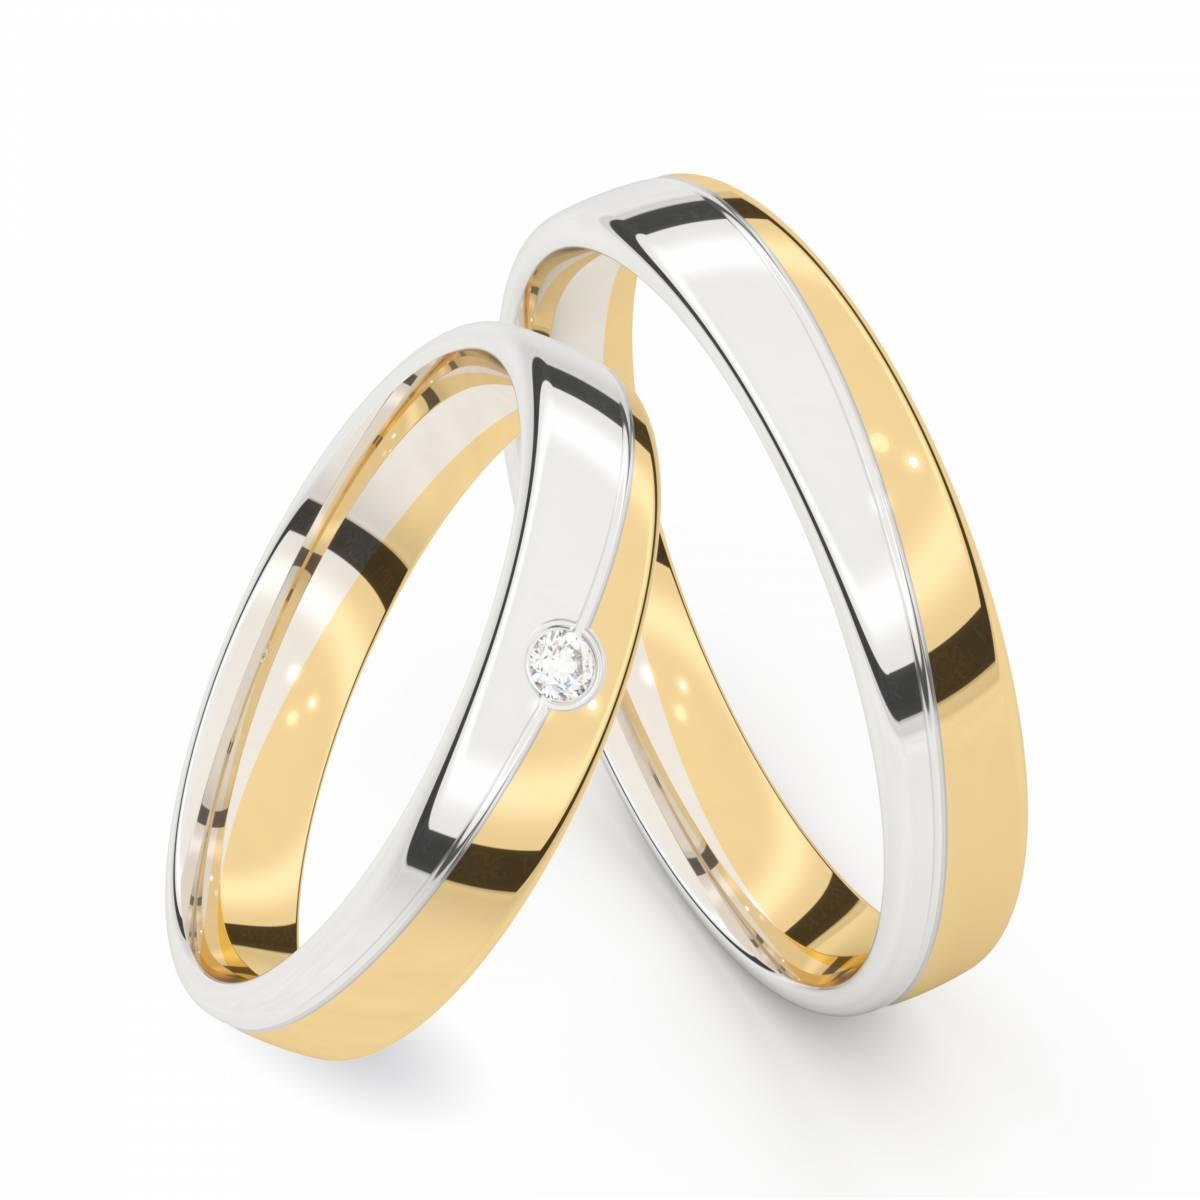 Juwelier Jan Maes - Trouwringen - Verlovingsringen - Juwelen - House of Weddings - 2